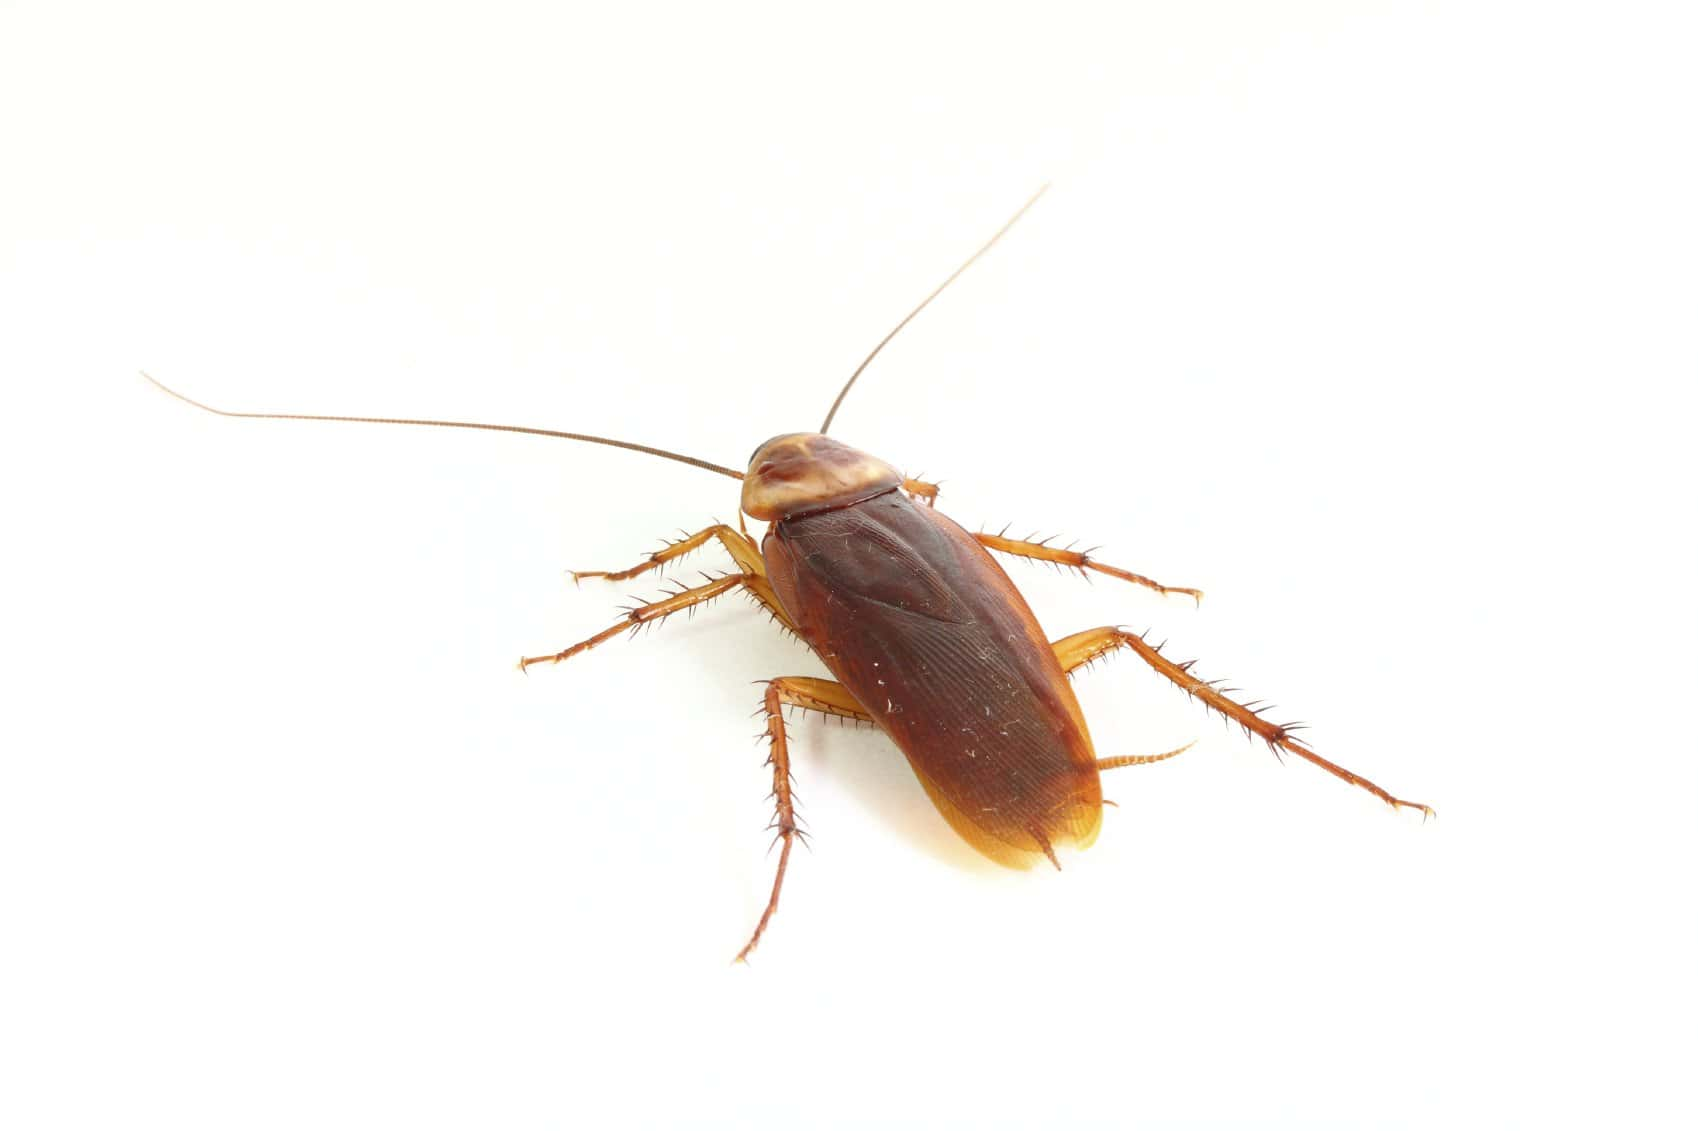 detectar cucarachas en casa 191d243nde las busco